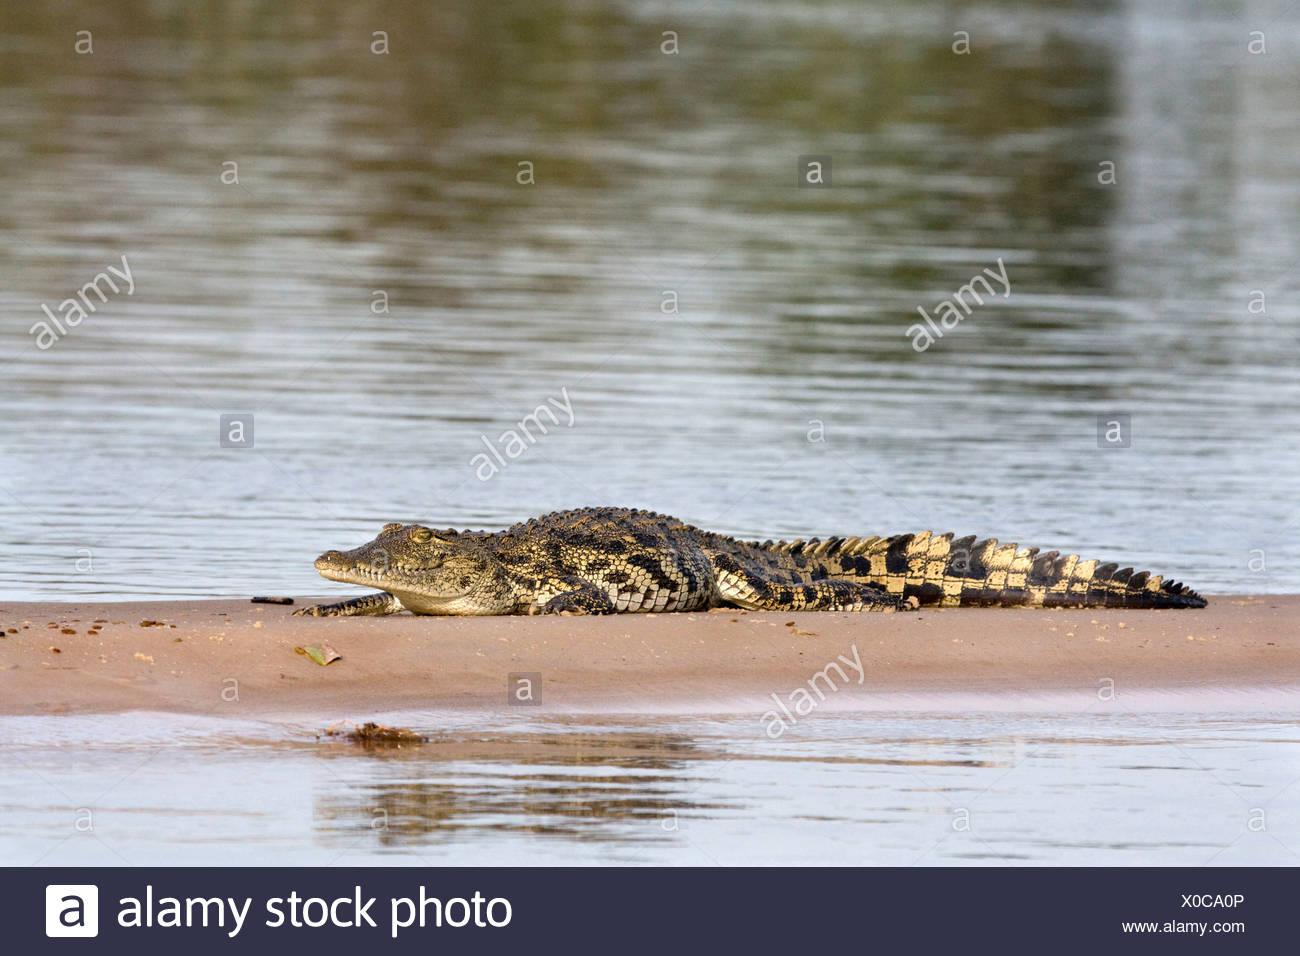 Nile crocodile (Crocodylus niloticus), resting on a sandbank at the Kawango River, Namibia, Mahango National Park - Stock Image